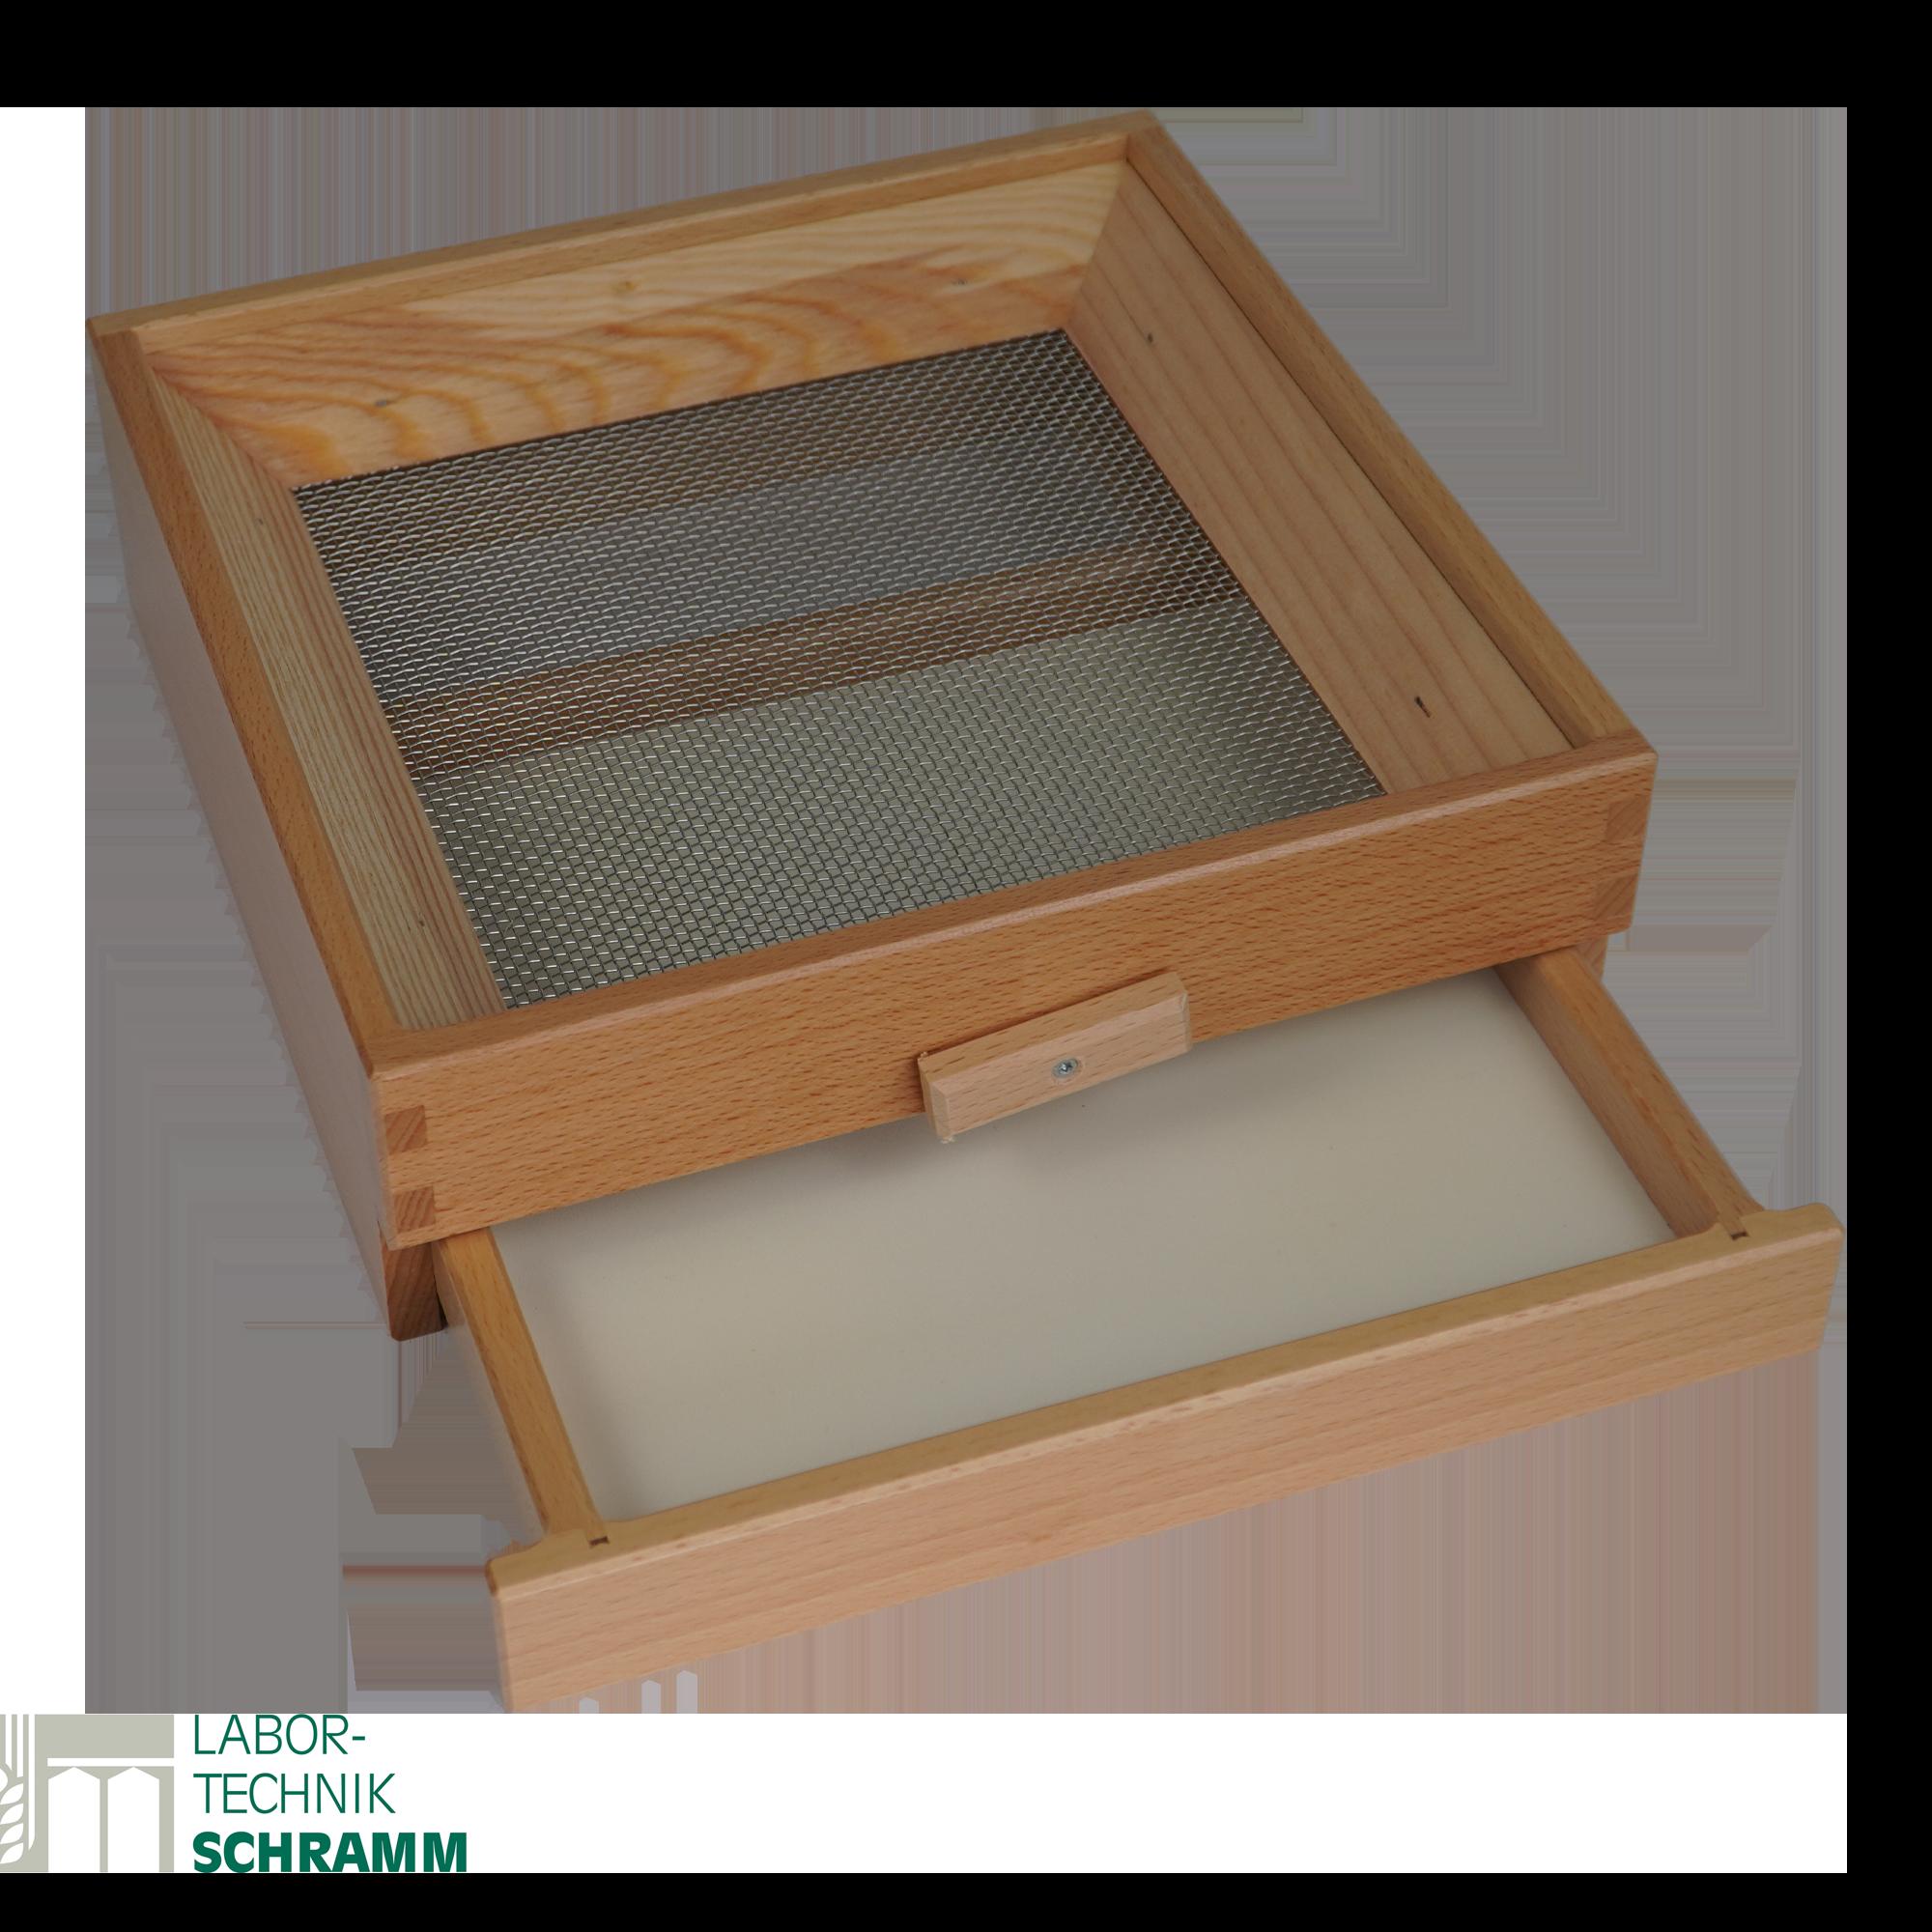 Käfersieb mit herausnehmbarer Schublade 40 x 40 cm